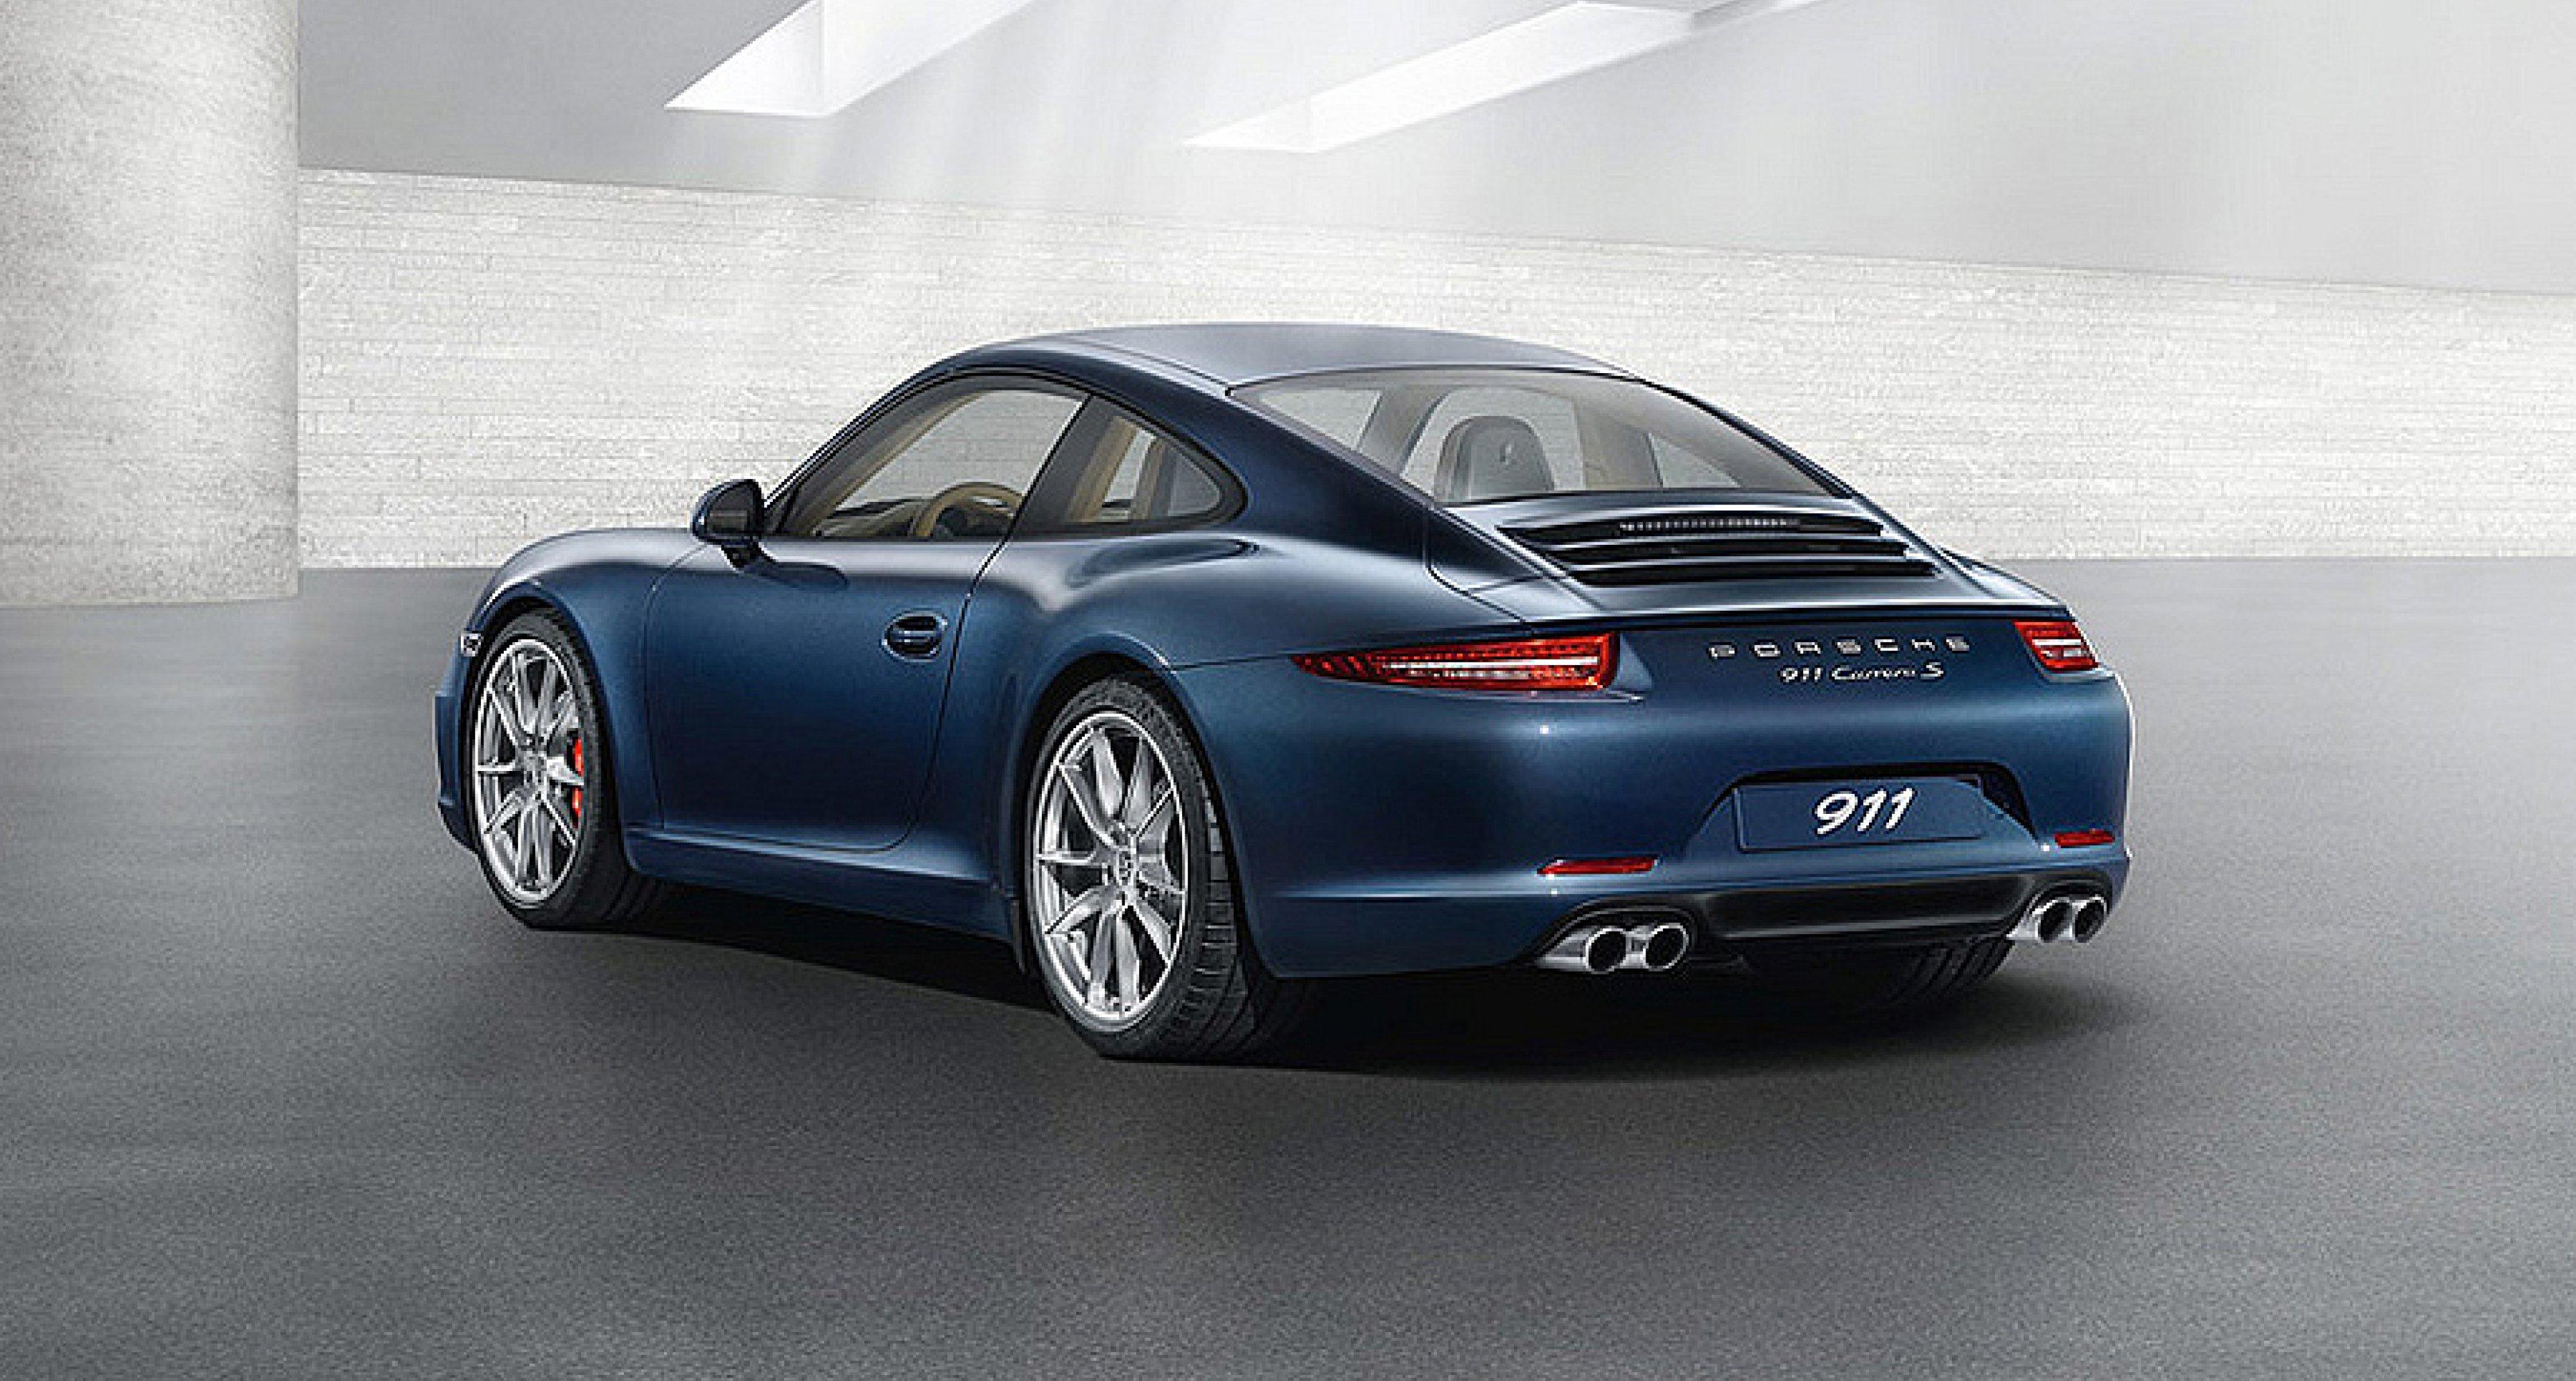 Fünf Fragen an: Walter Röhrl, Porschefahrer